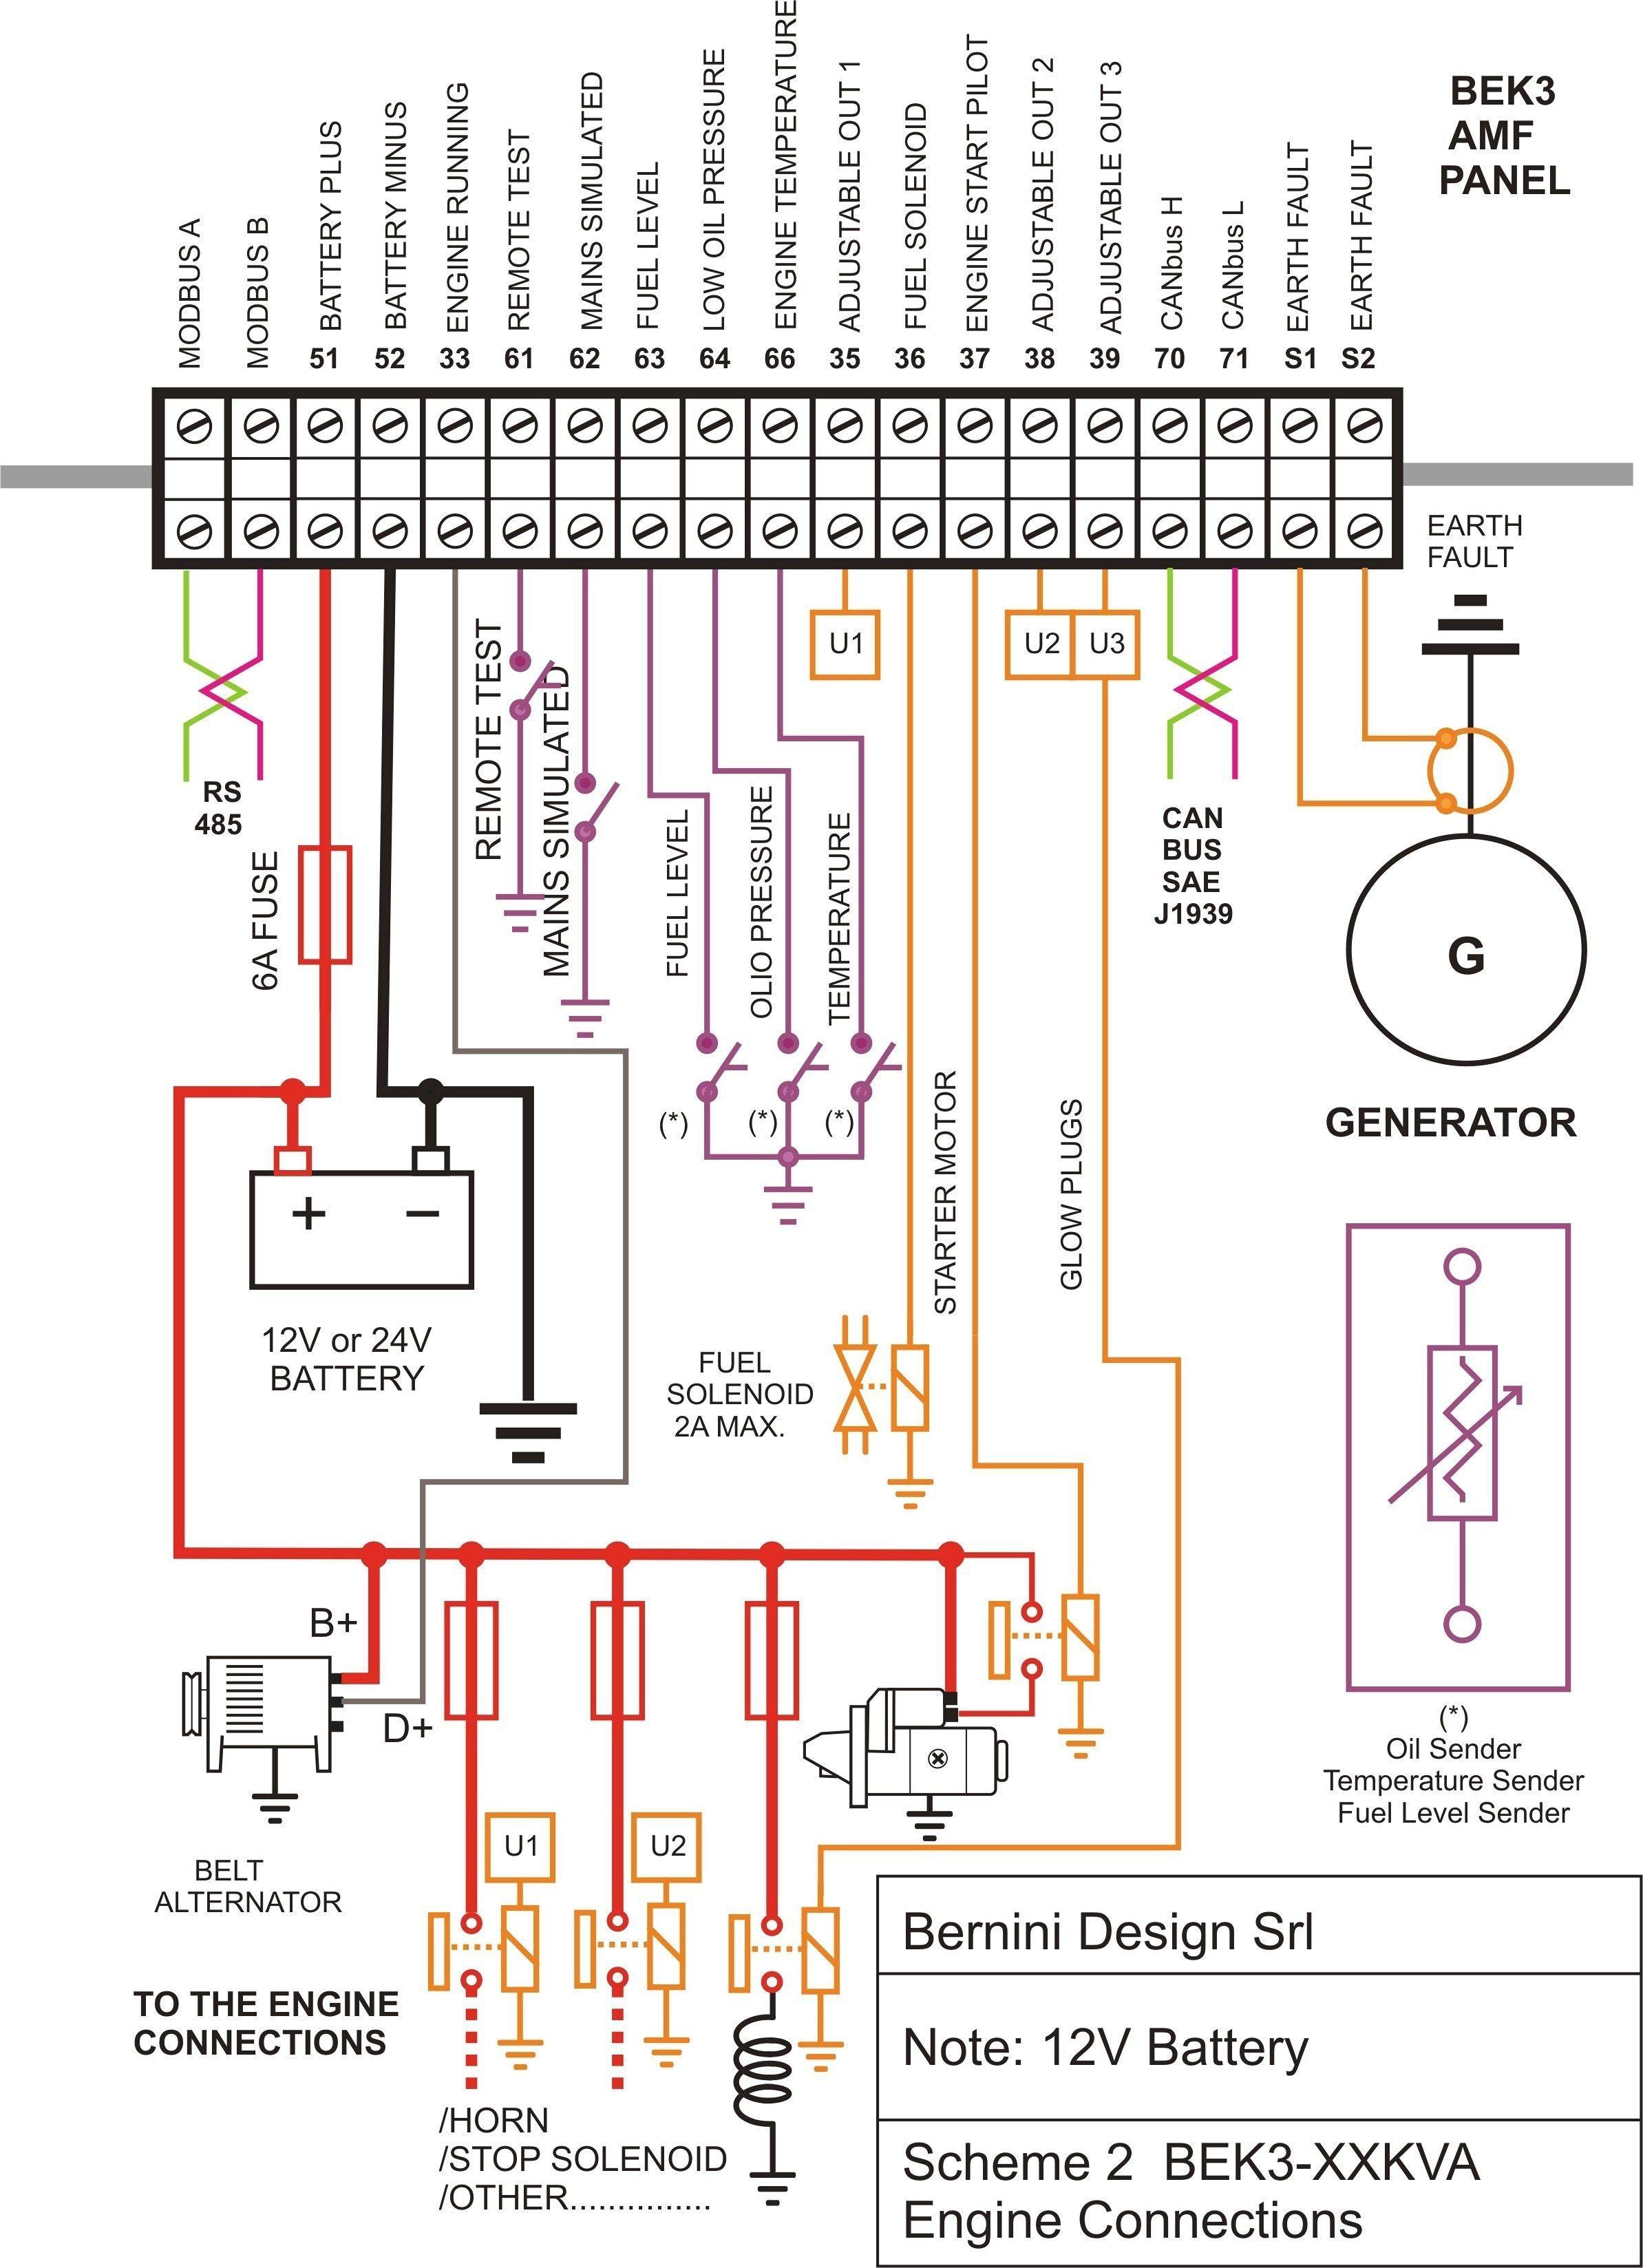 Pin By W Wojewodka On Tecnologia In 2020 Electrical Wiring Diagram Electrical Circuit Diagram Circuit Diagram